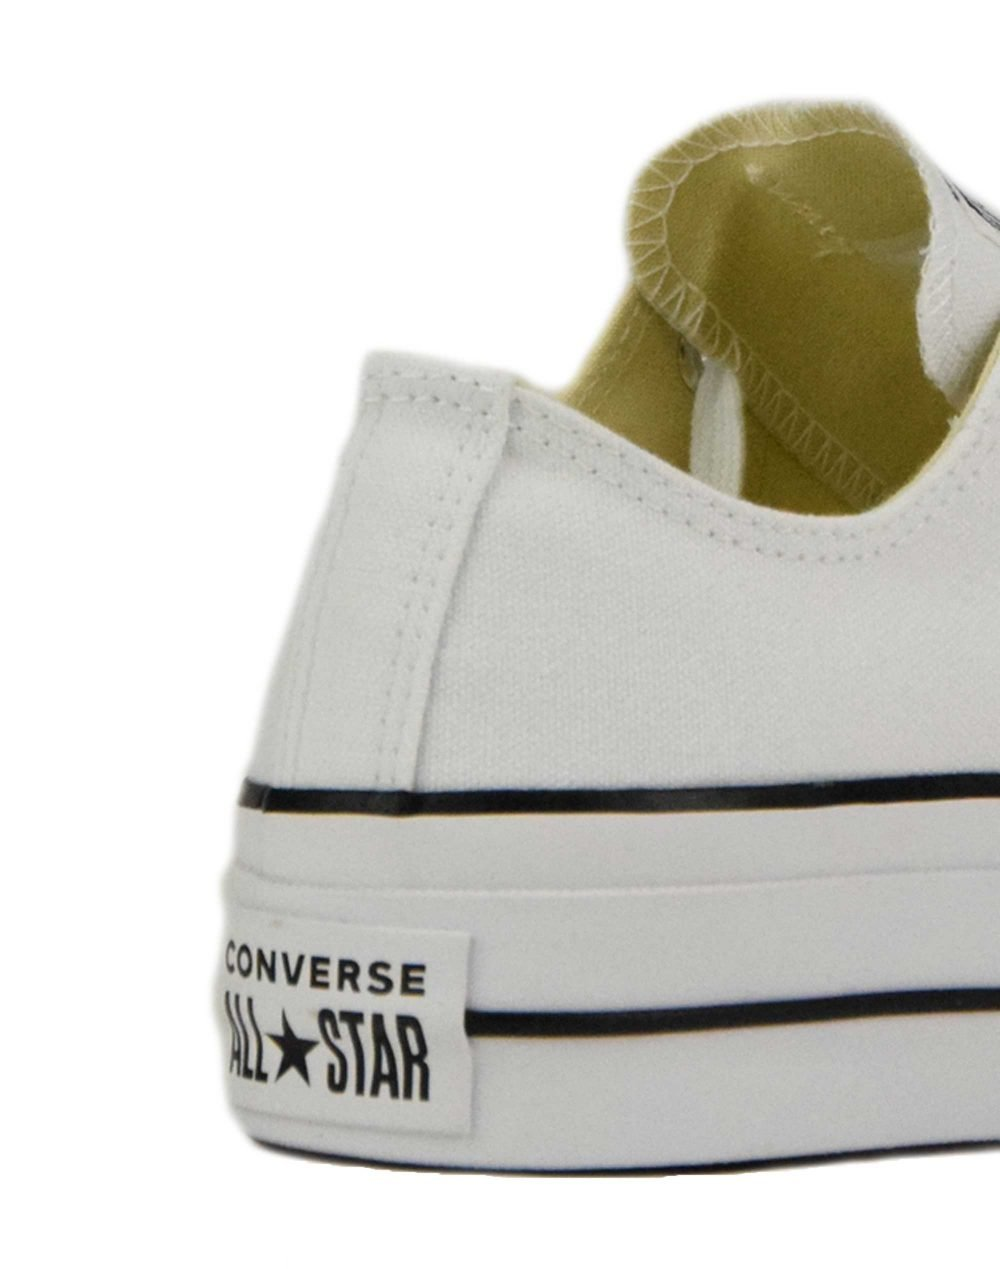 Converse Chuck Taylor All Star Lift Platform (560251) White/Black